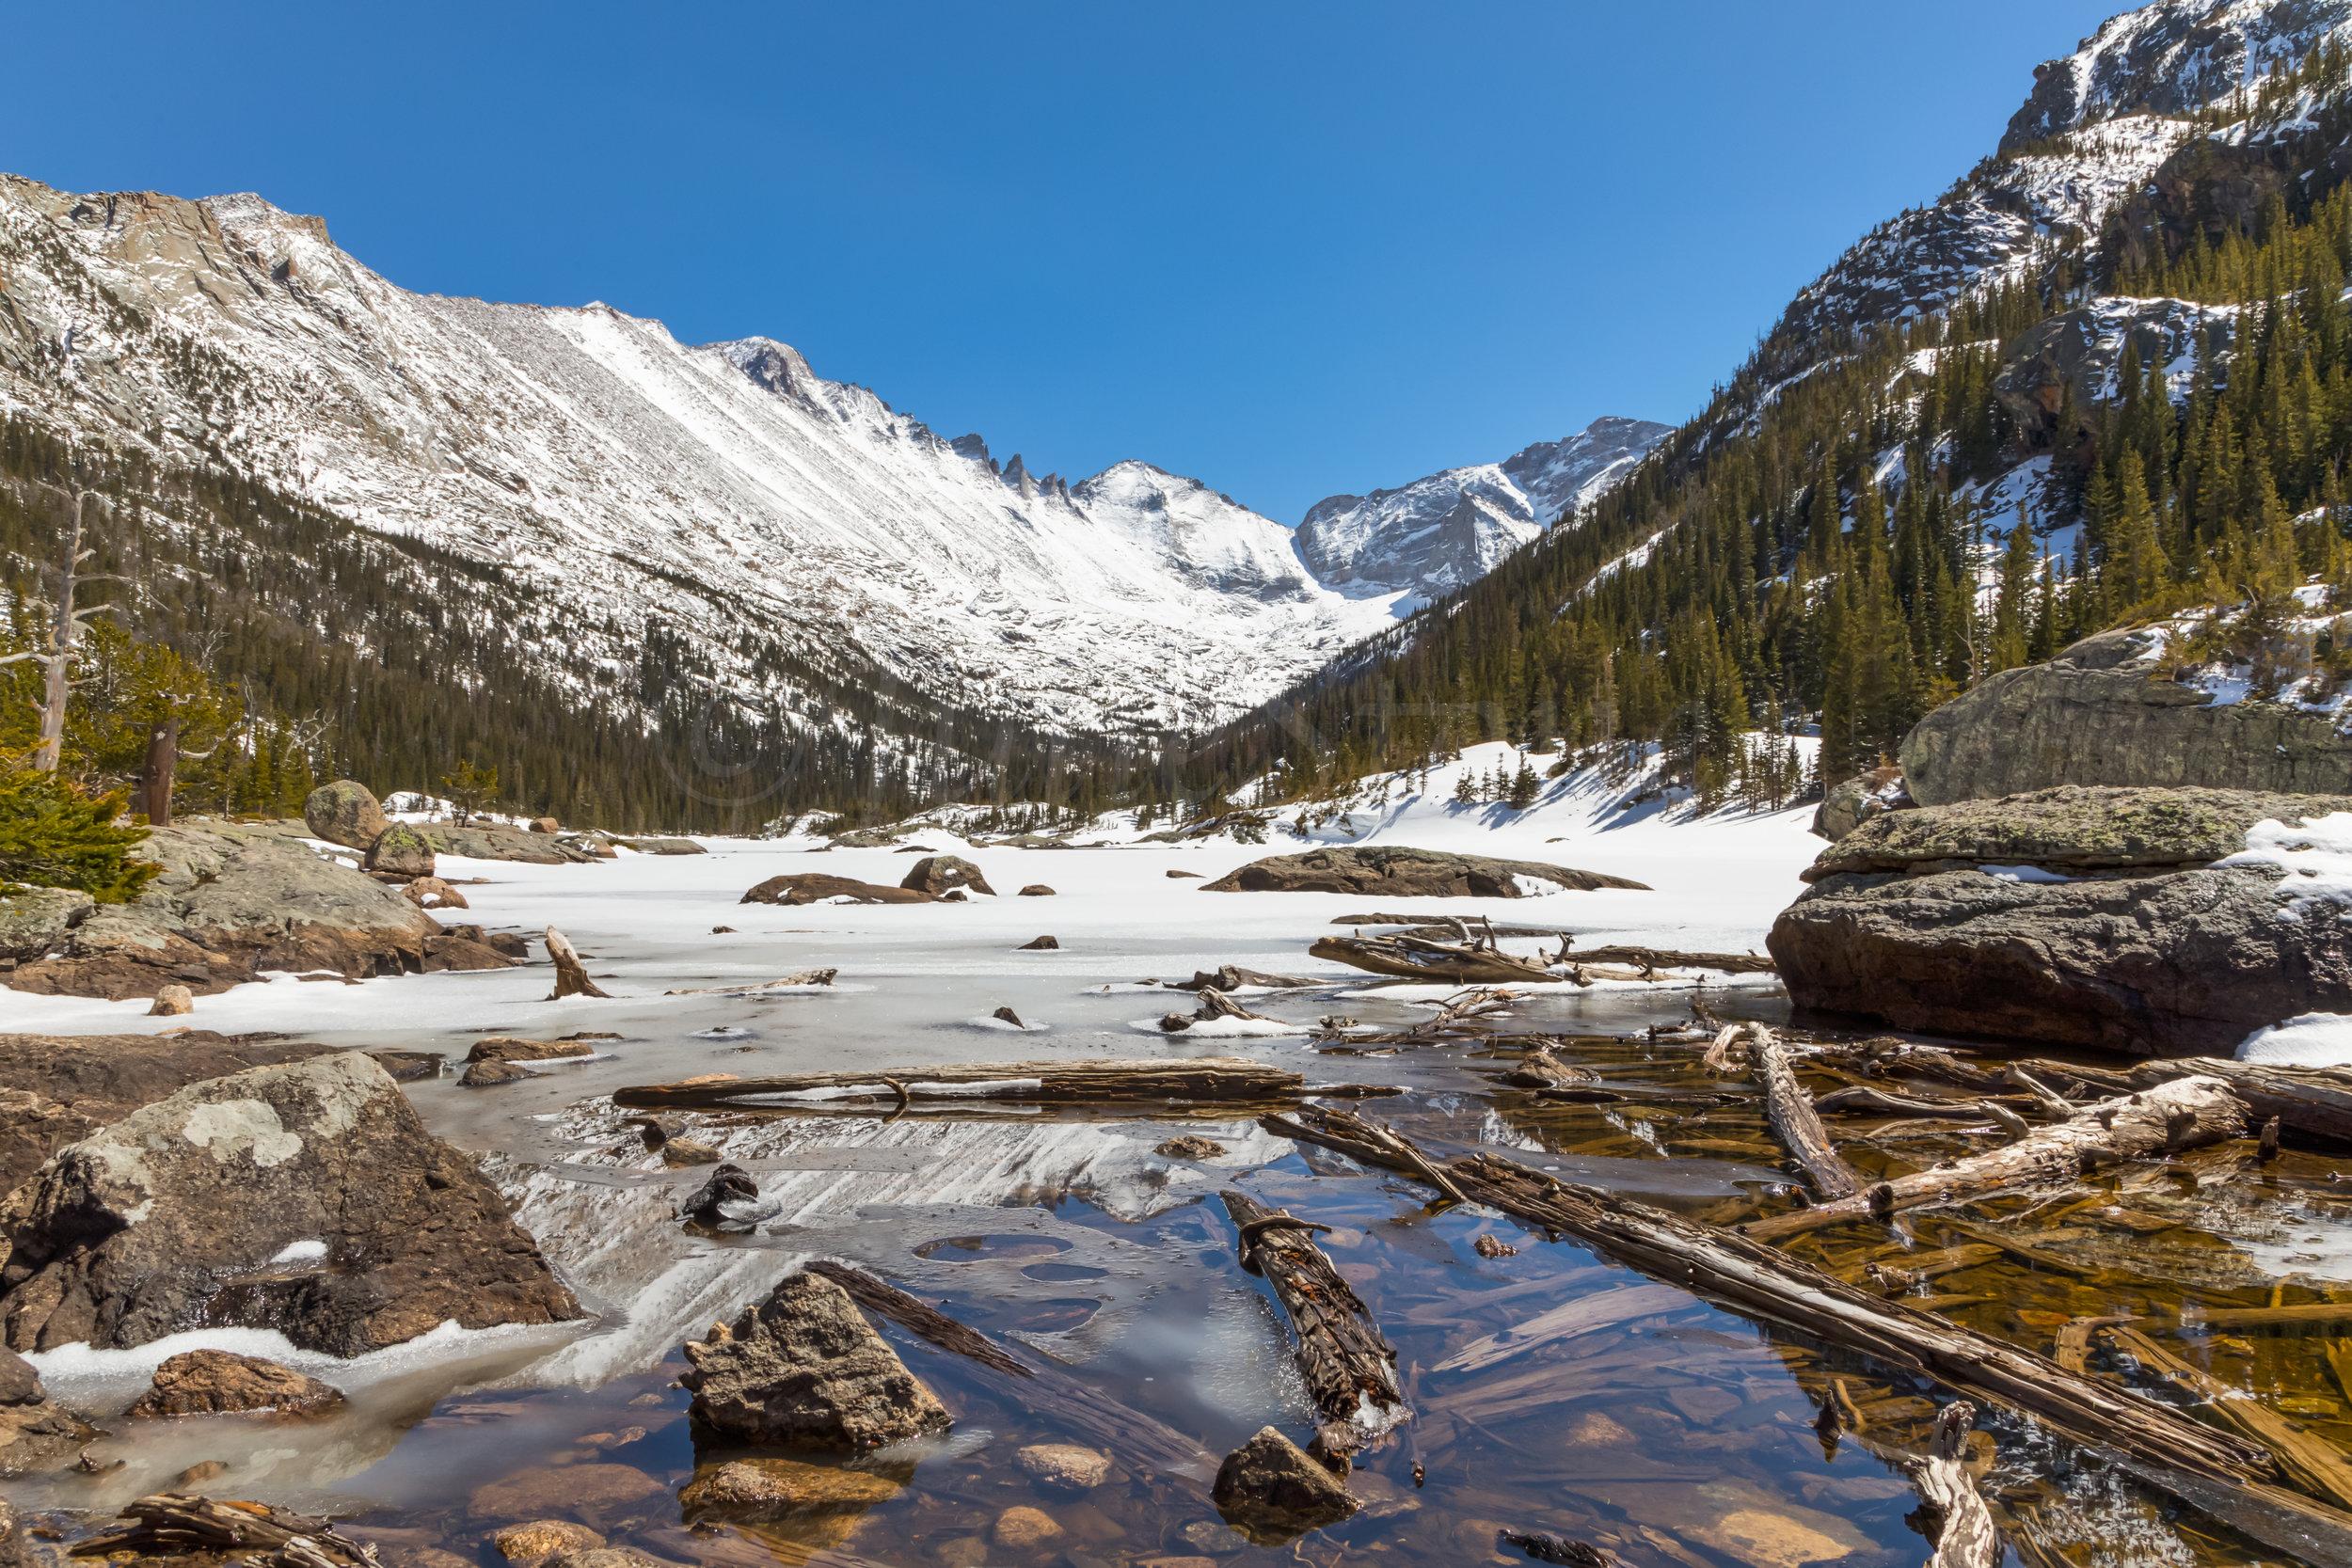 Rocky Mountain National Park, Image # 5568